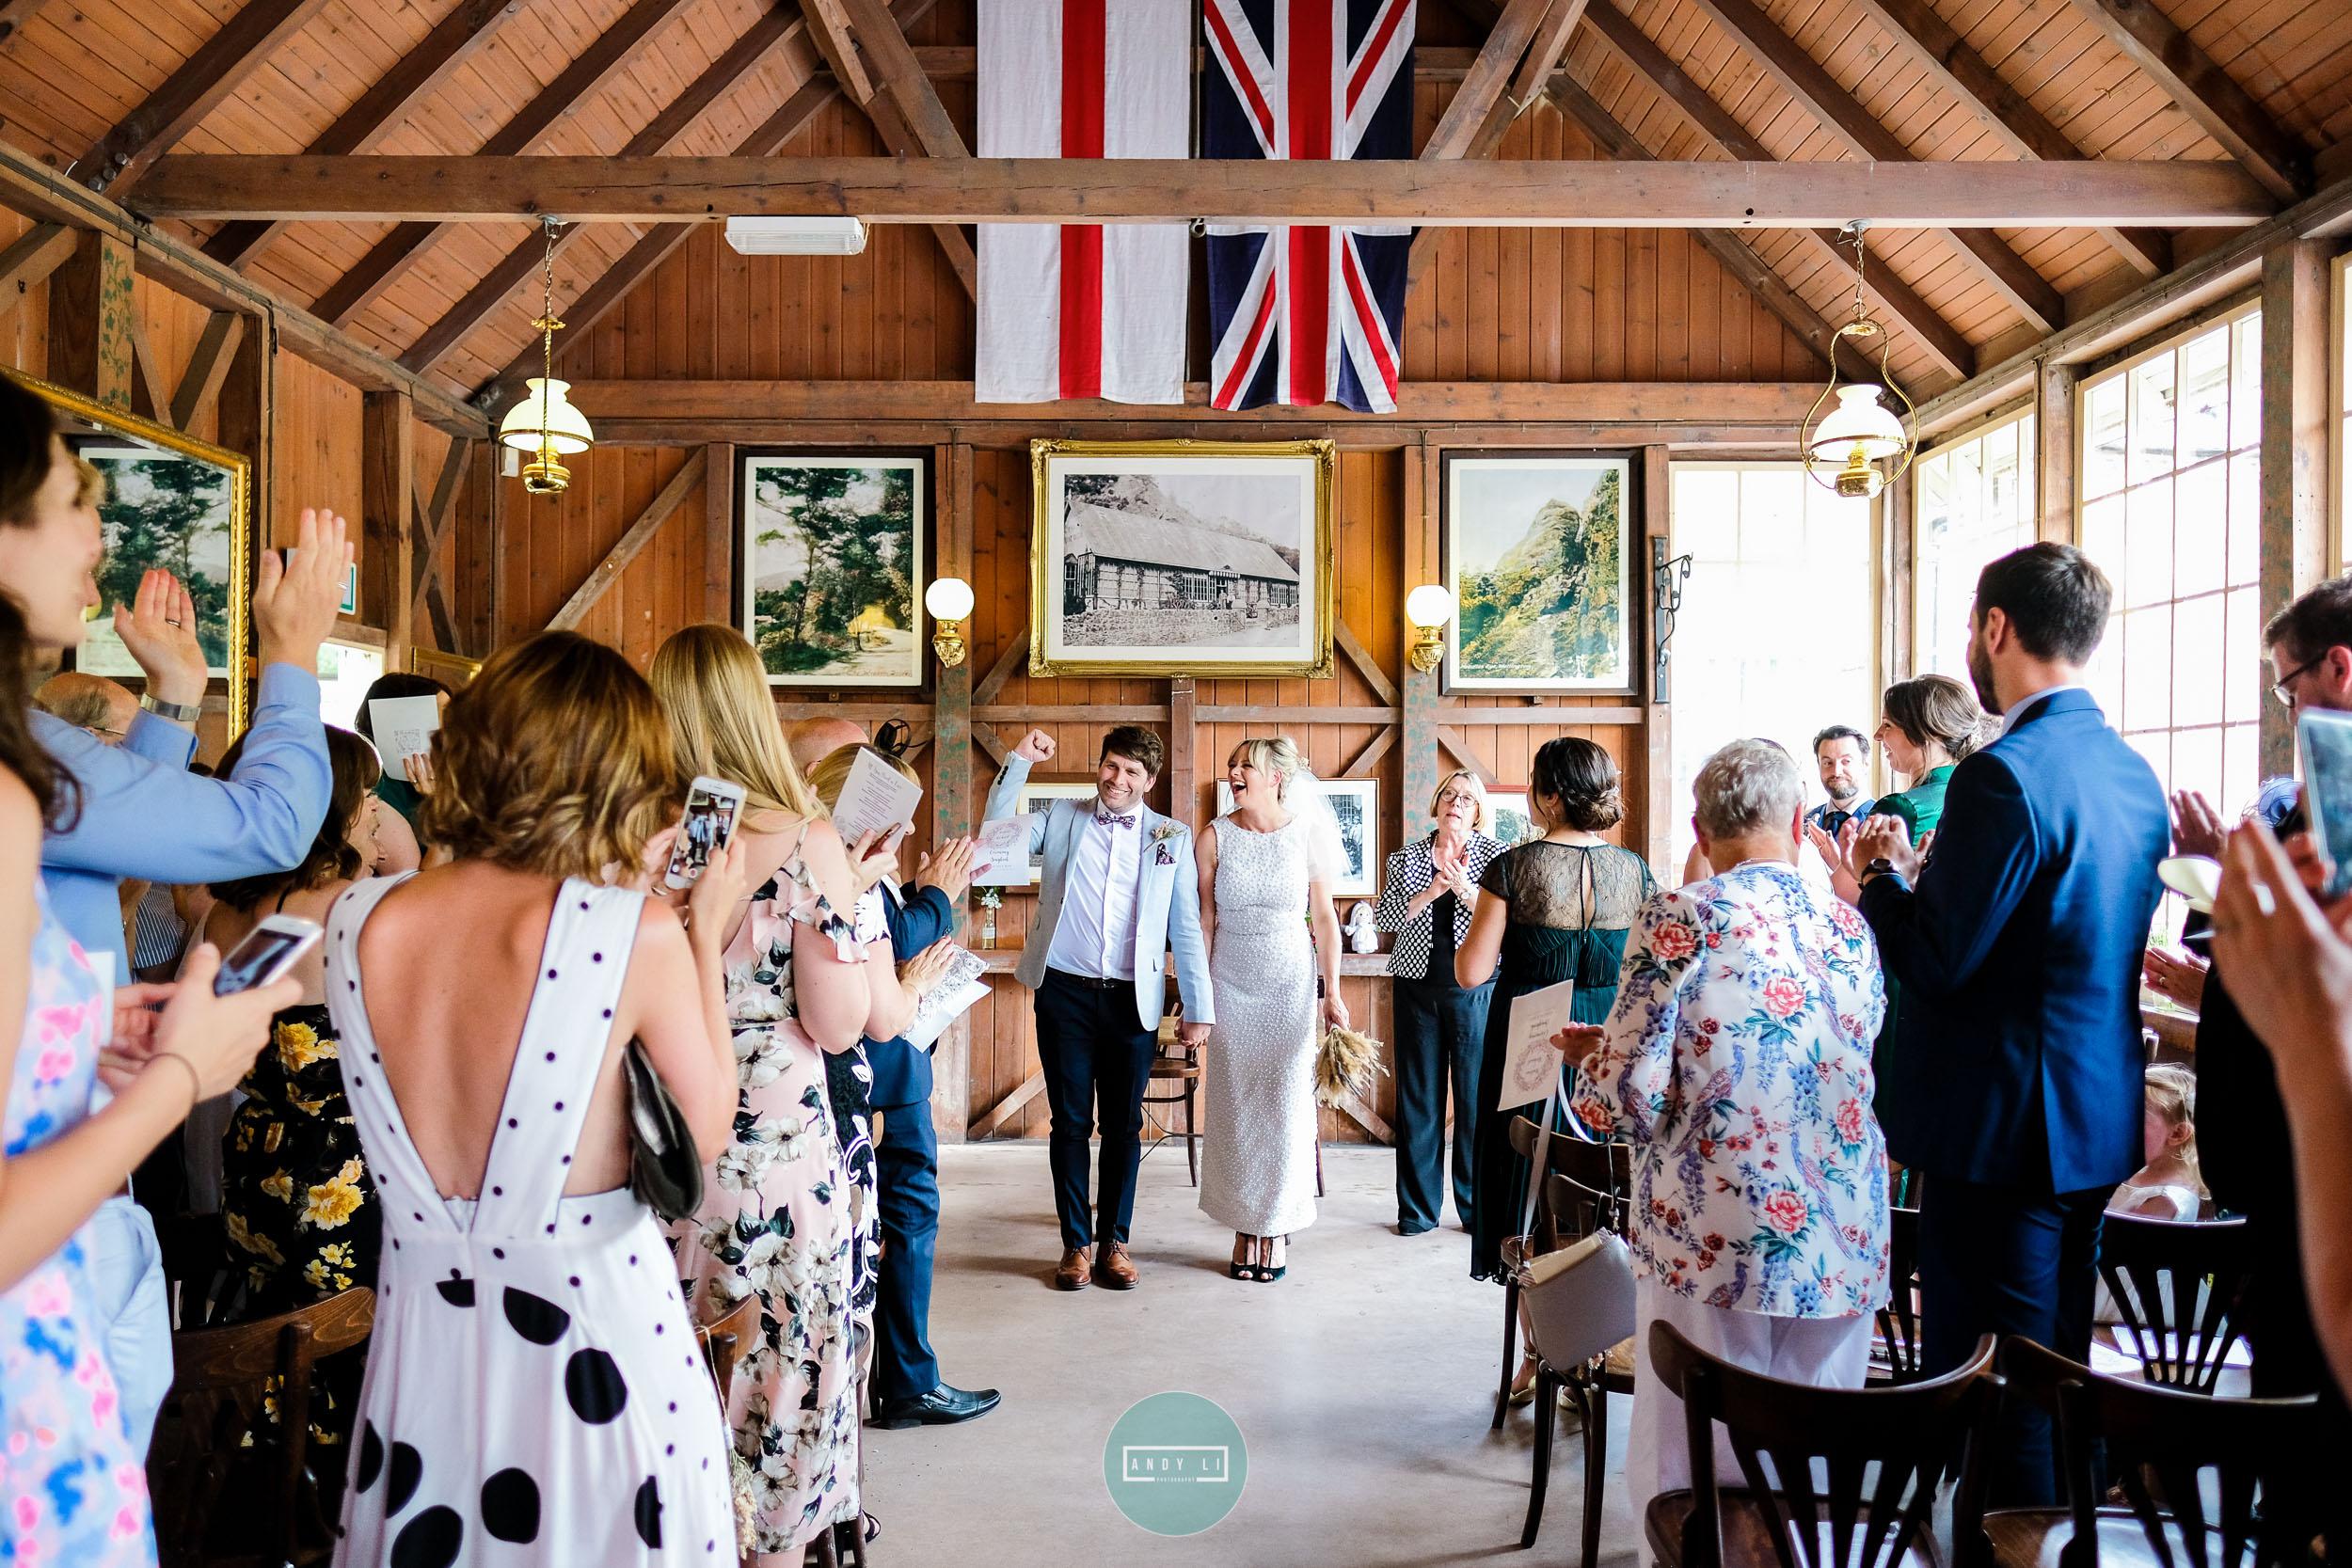 Blists Hill Victorian Town Ironbridge Wedding Photographer-001-XPRO6803.jpg